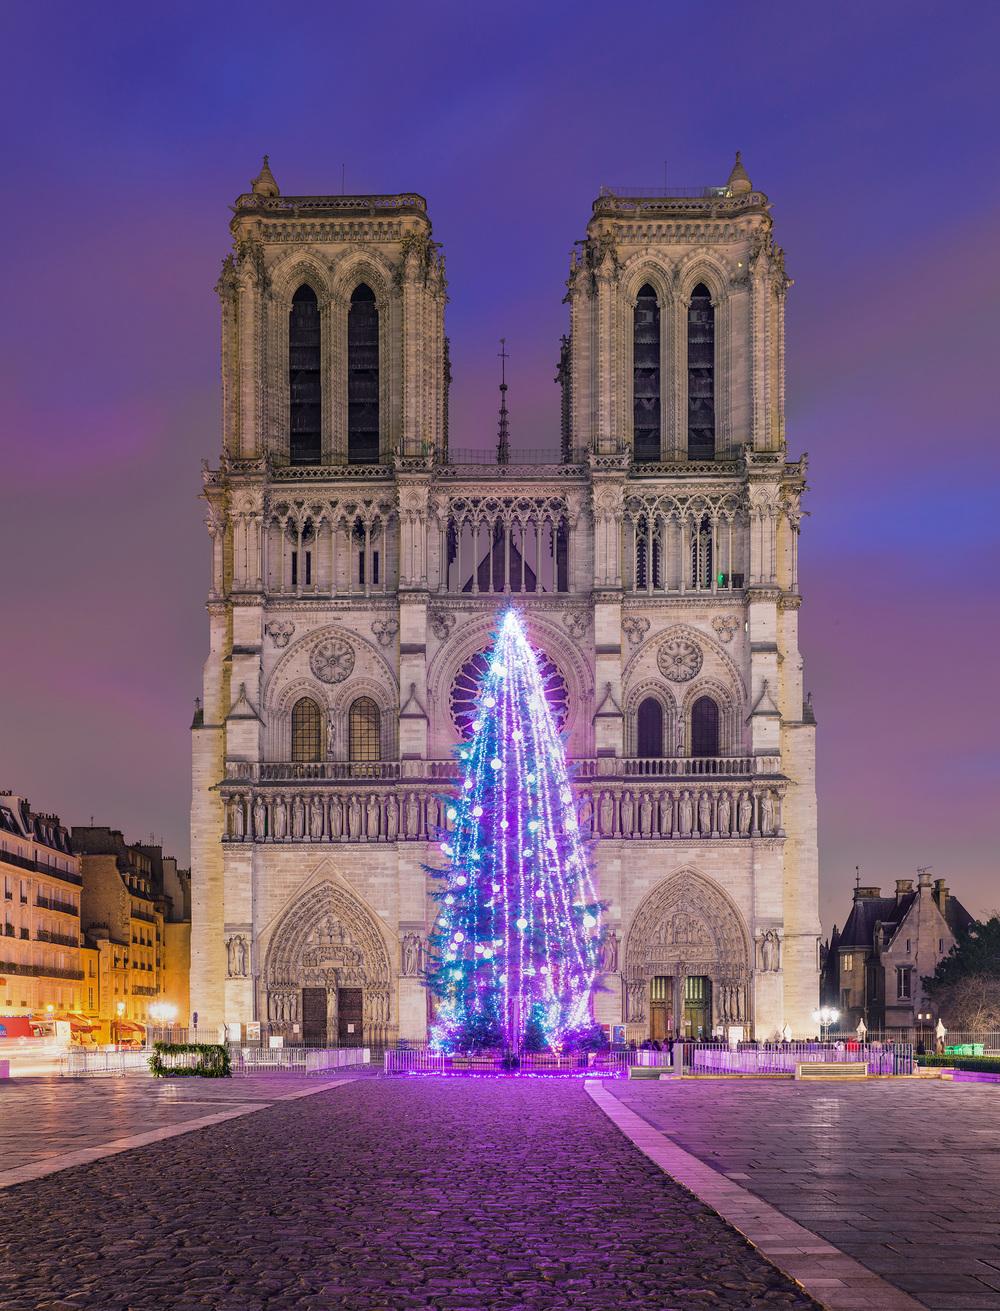 Notre Dame, Christmas 2014, 183 megapixels